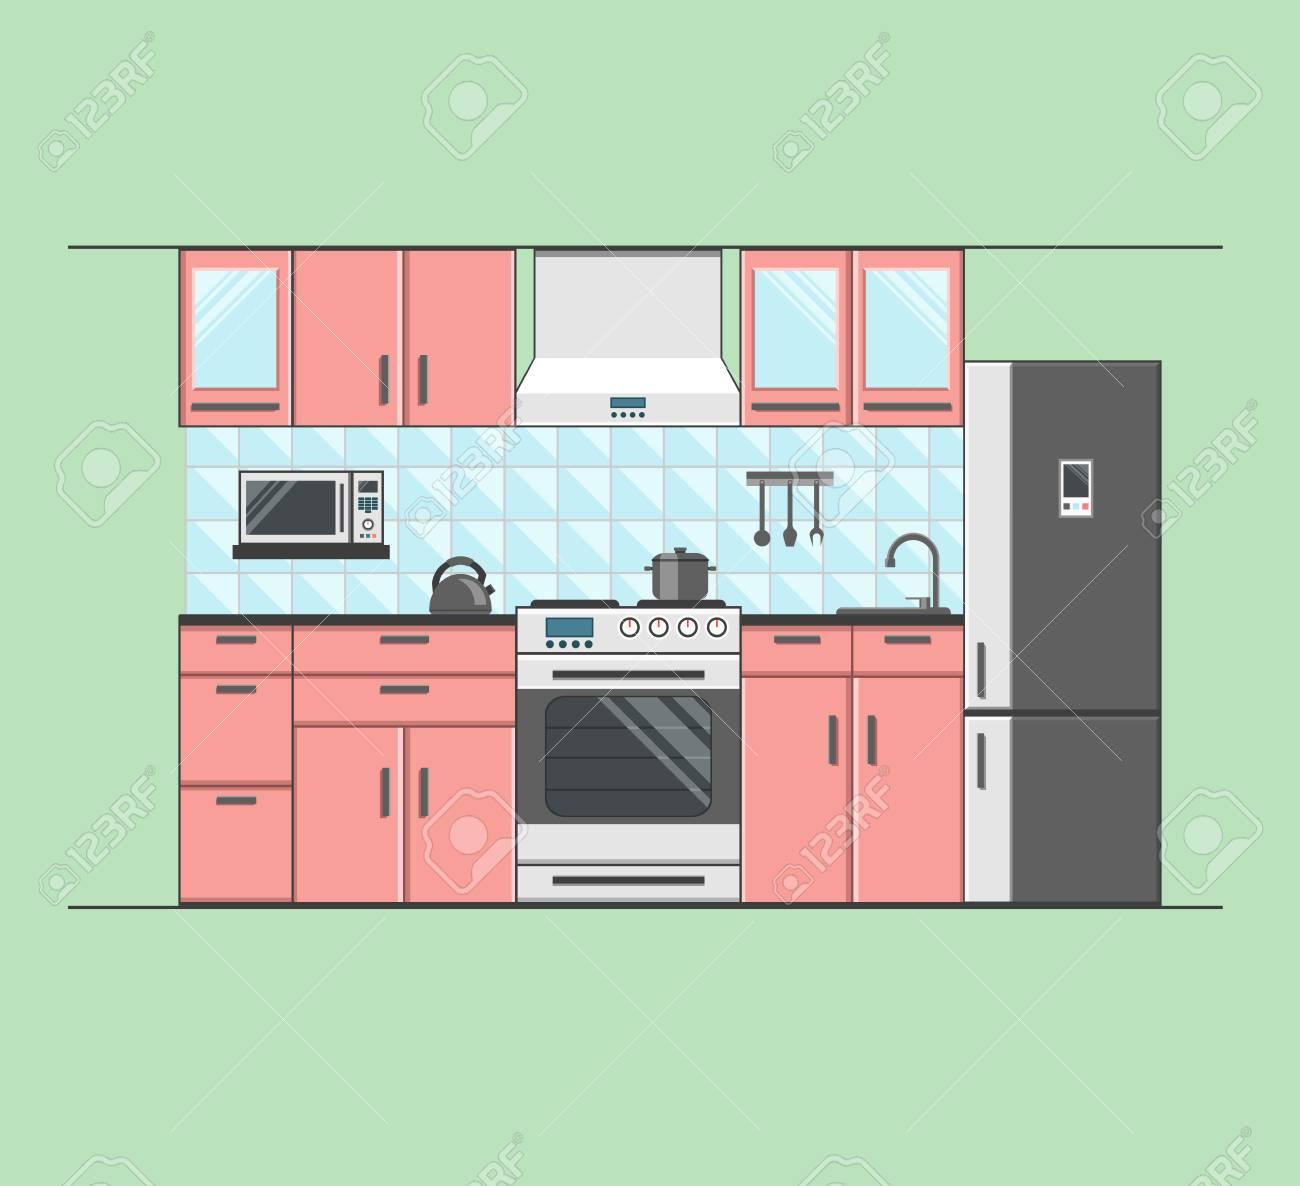 Kitchen Interior With Furniture Microwave Oven Fridge Teapot